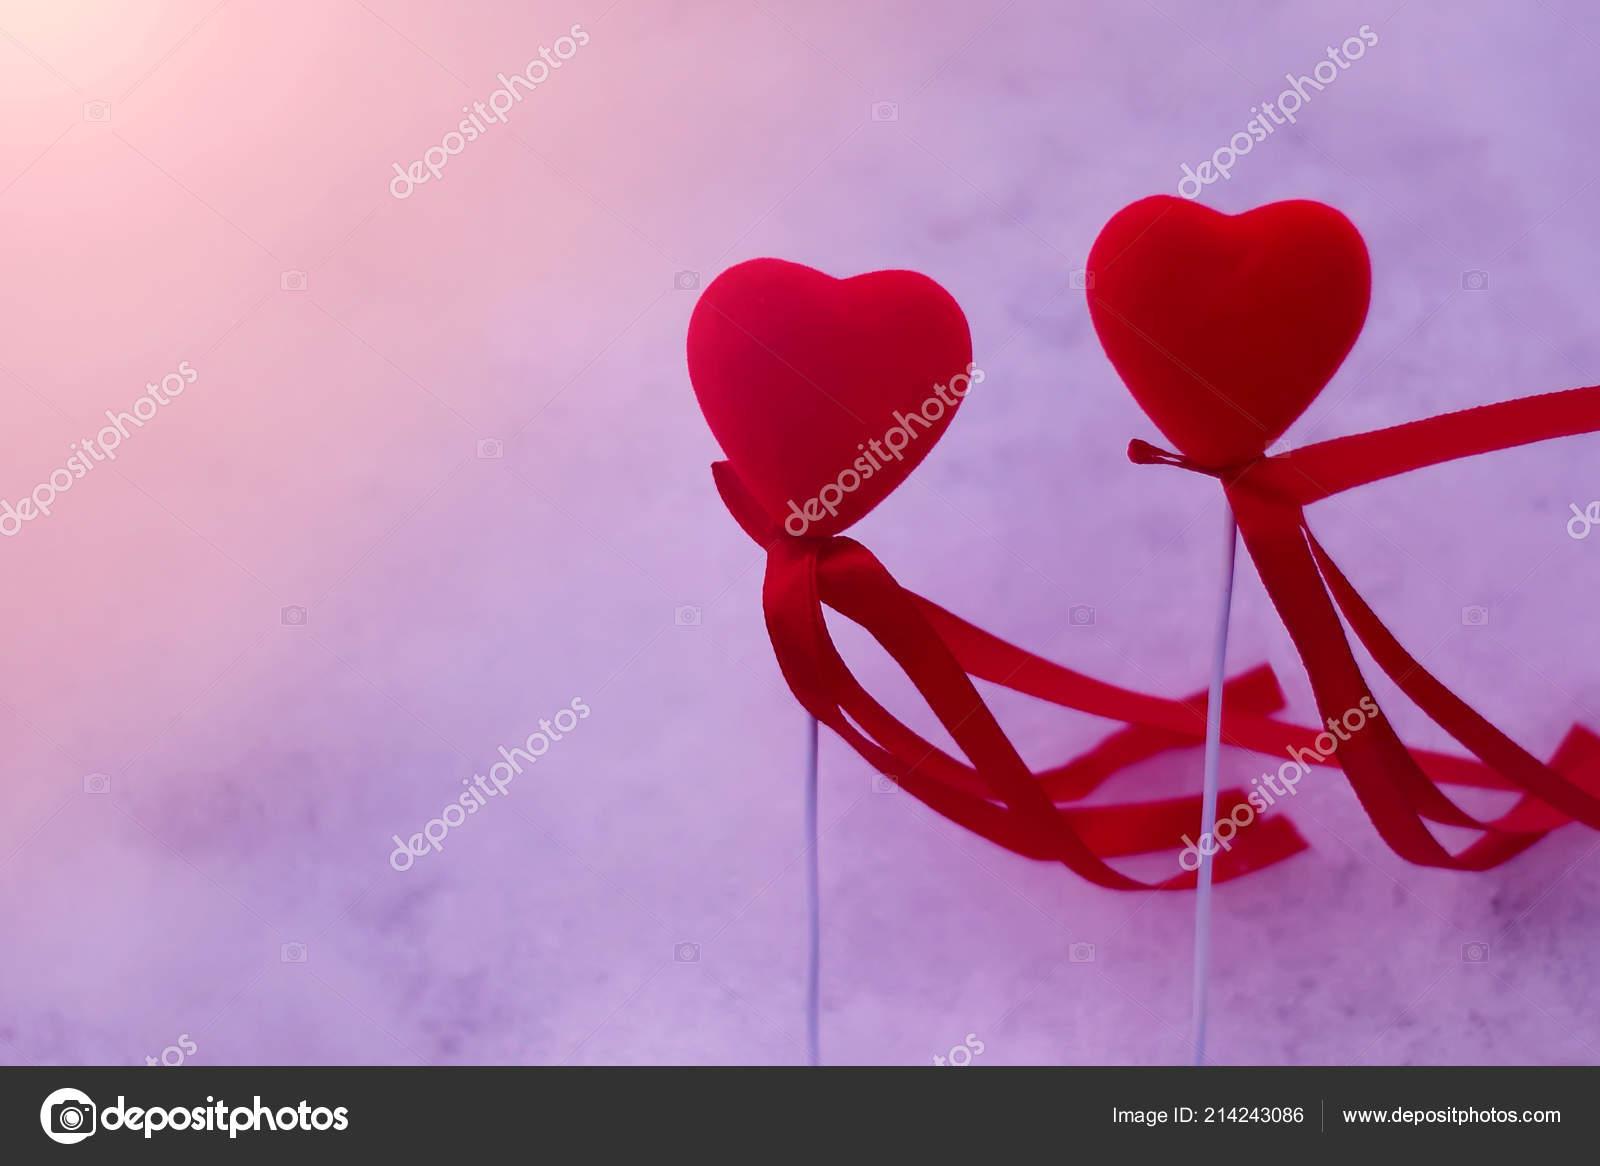 Heart Symbols Snow Background Mayk75 214243086